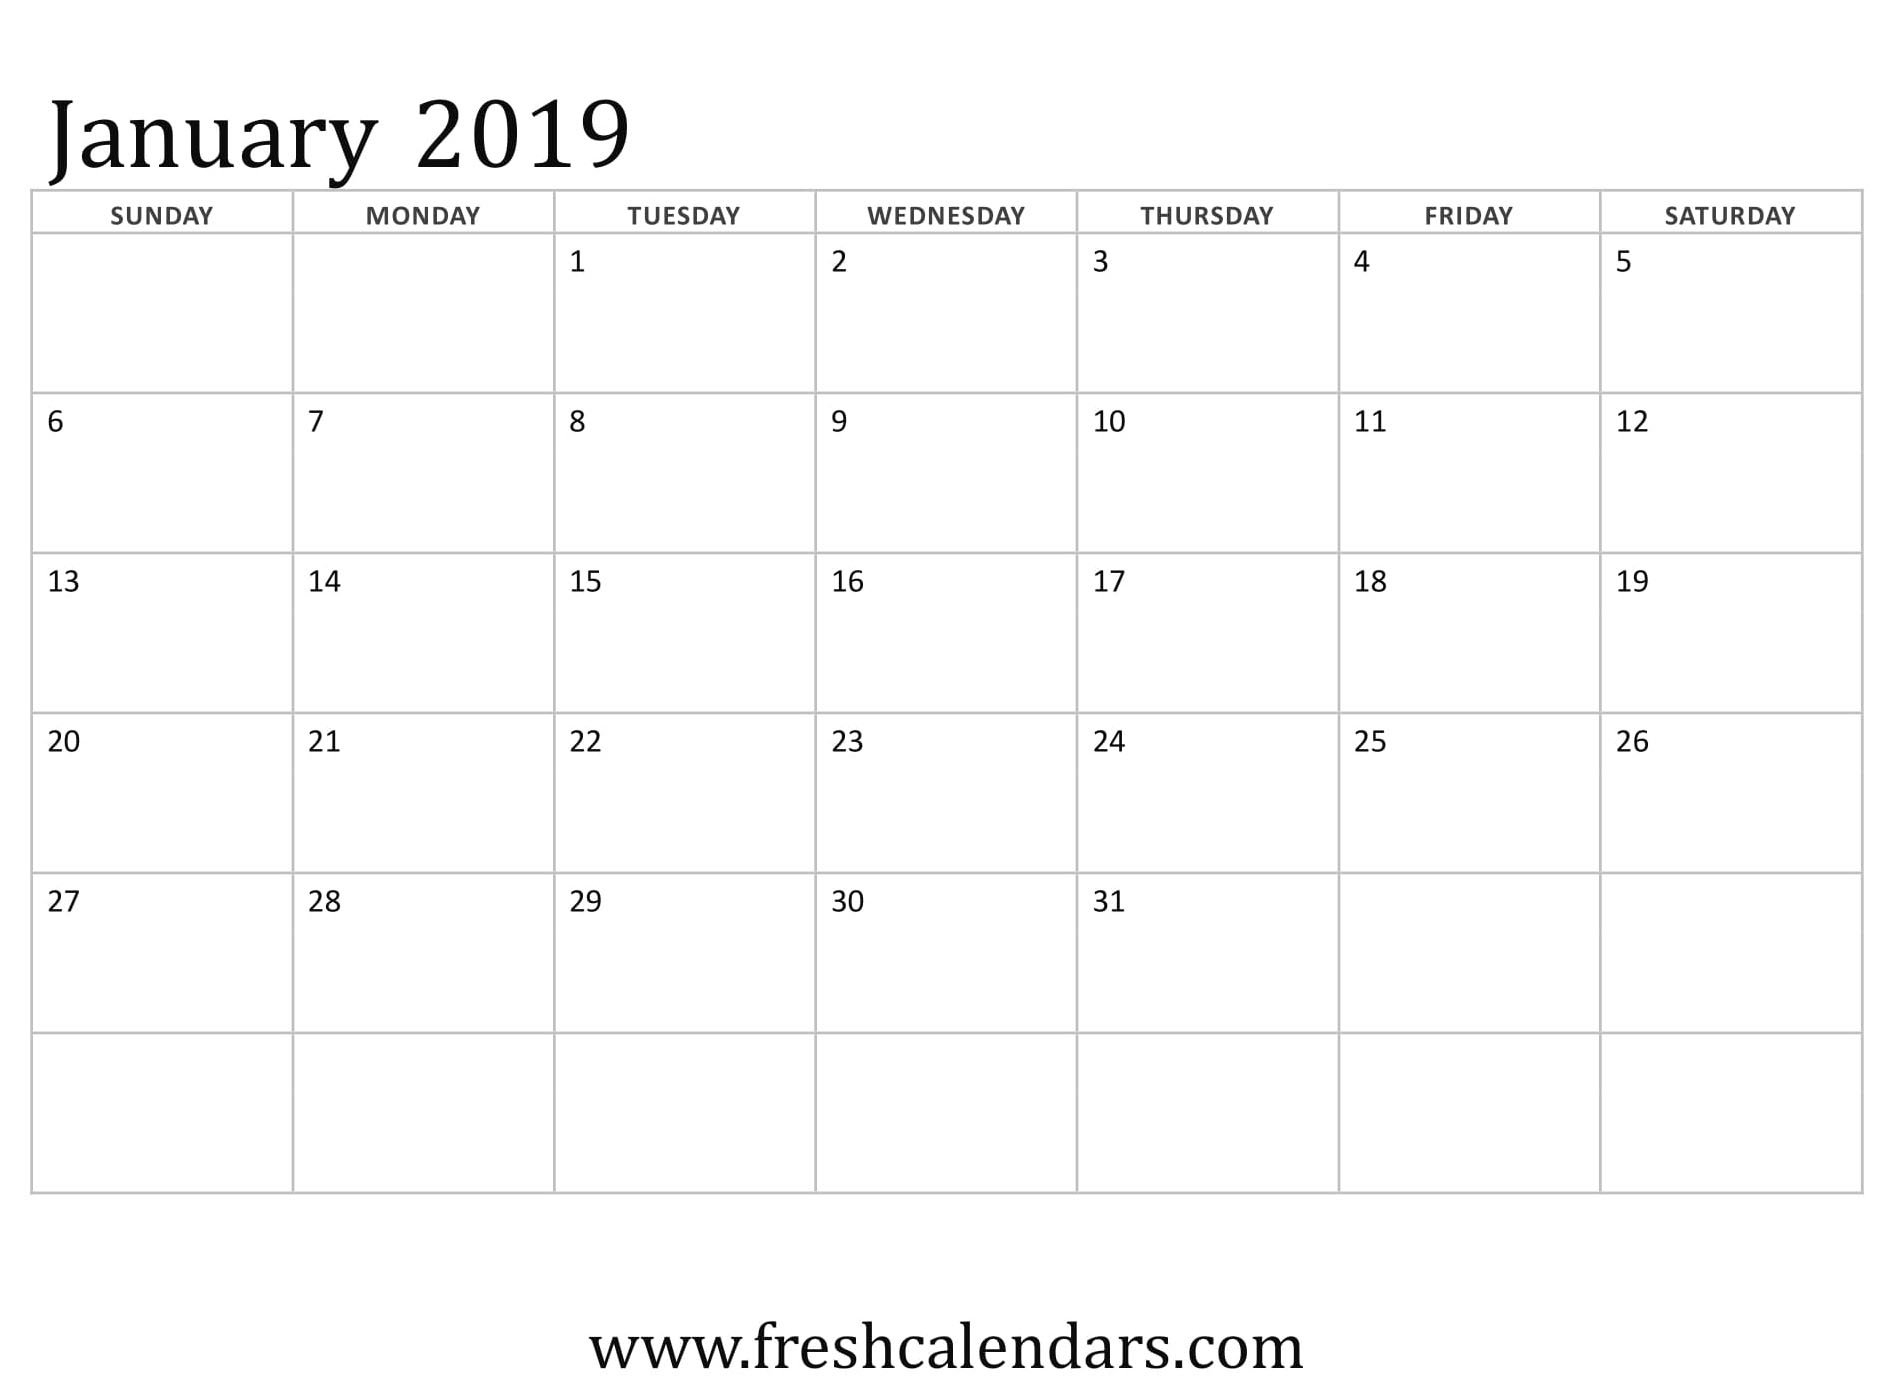 January 2019 Printable Calendars – Fresh Calendars Calendar 2019 11X17